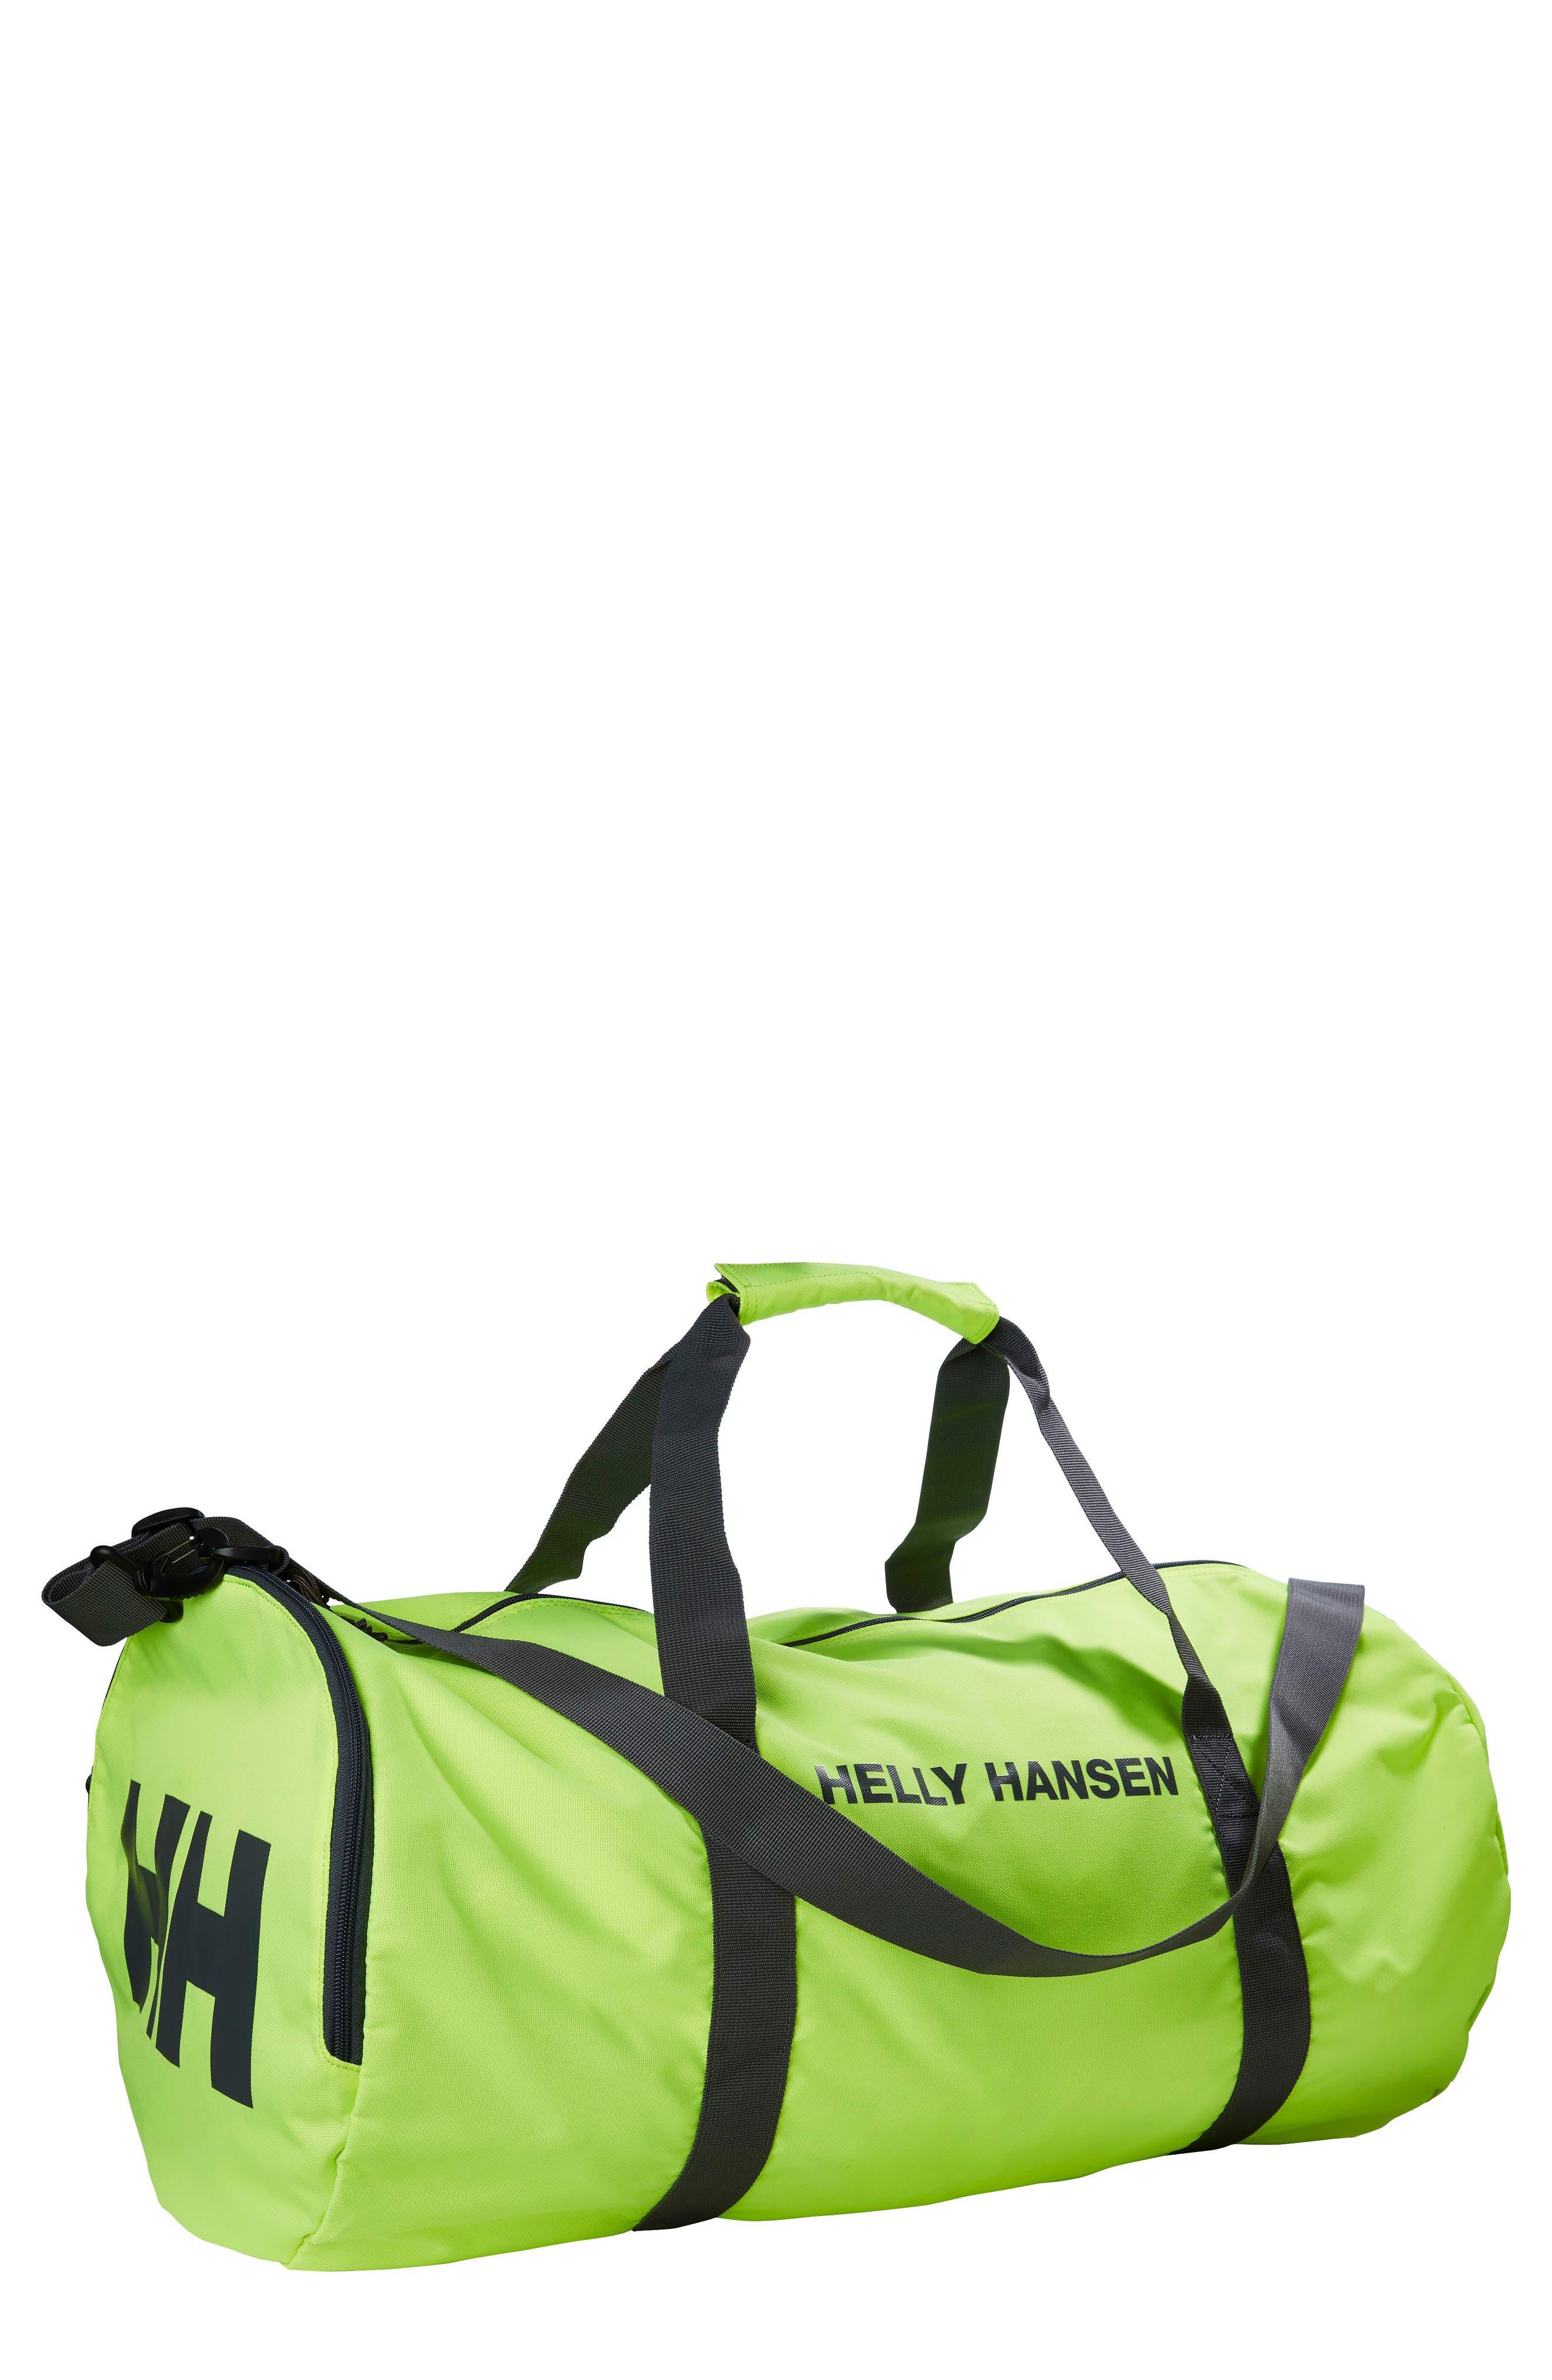 Alternate Image 1 Selected - Helly Hansen Medium Packable Duffel Bag